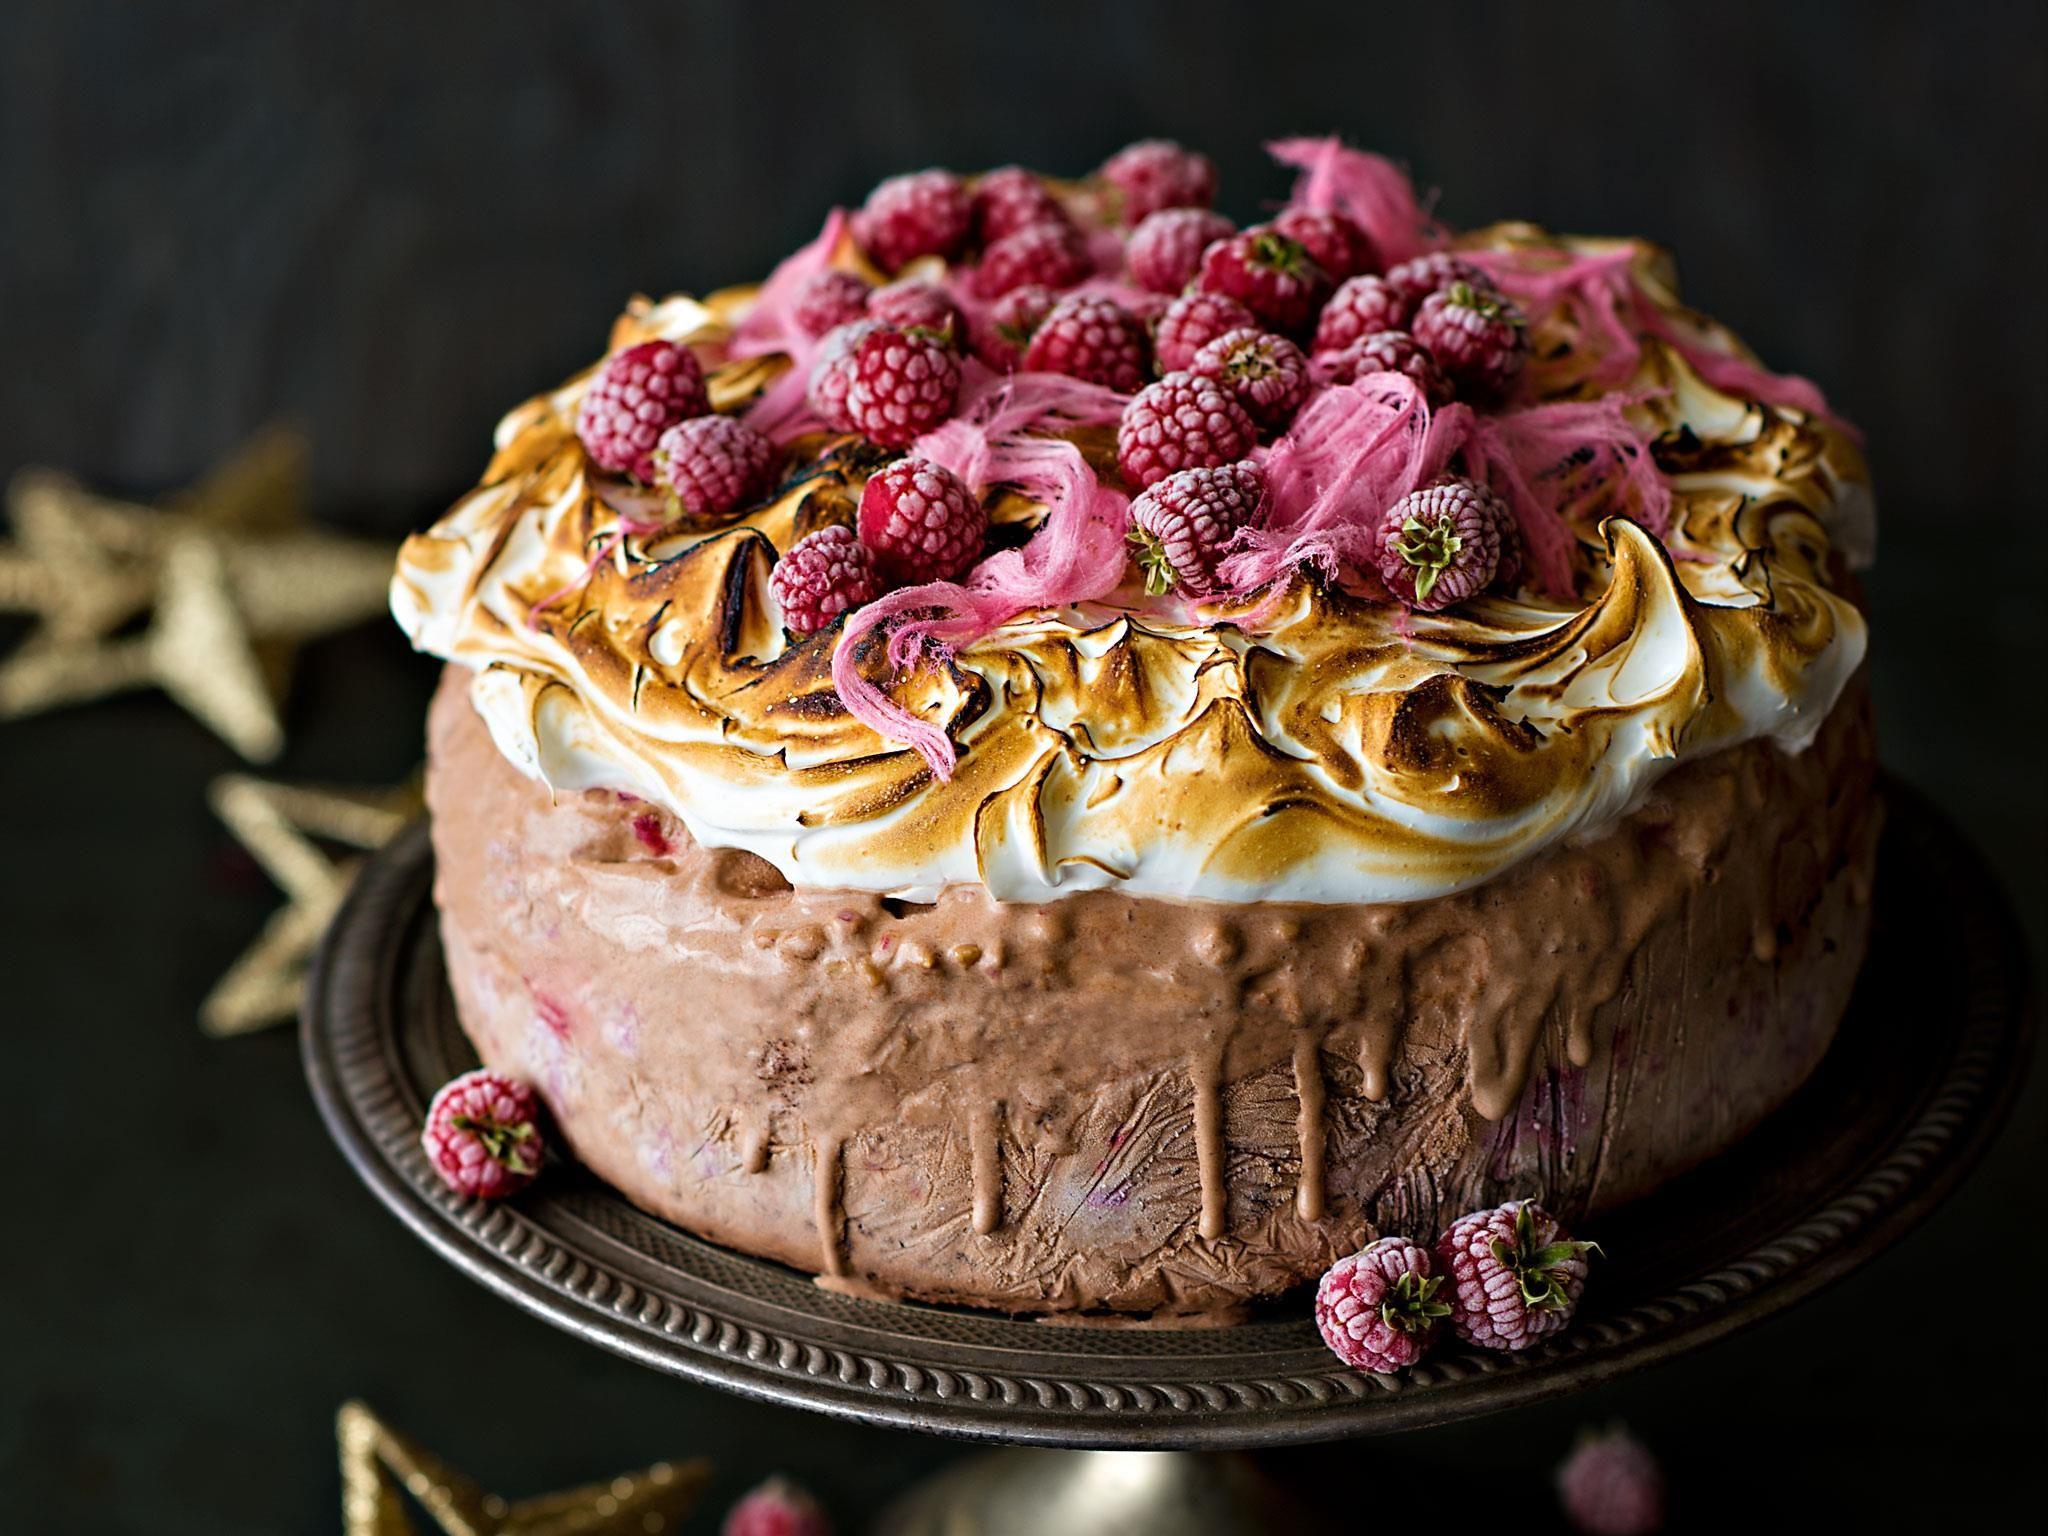 Hazelnut and chocolate ice cream cake recipe chocolate